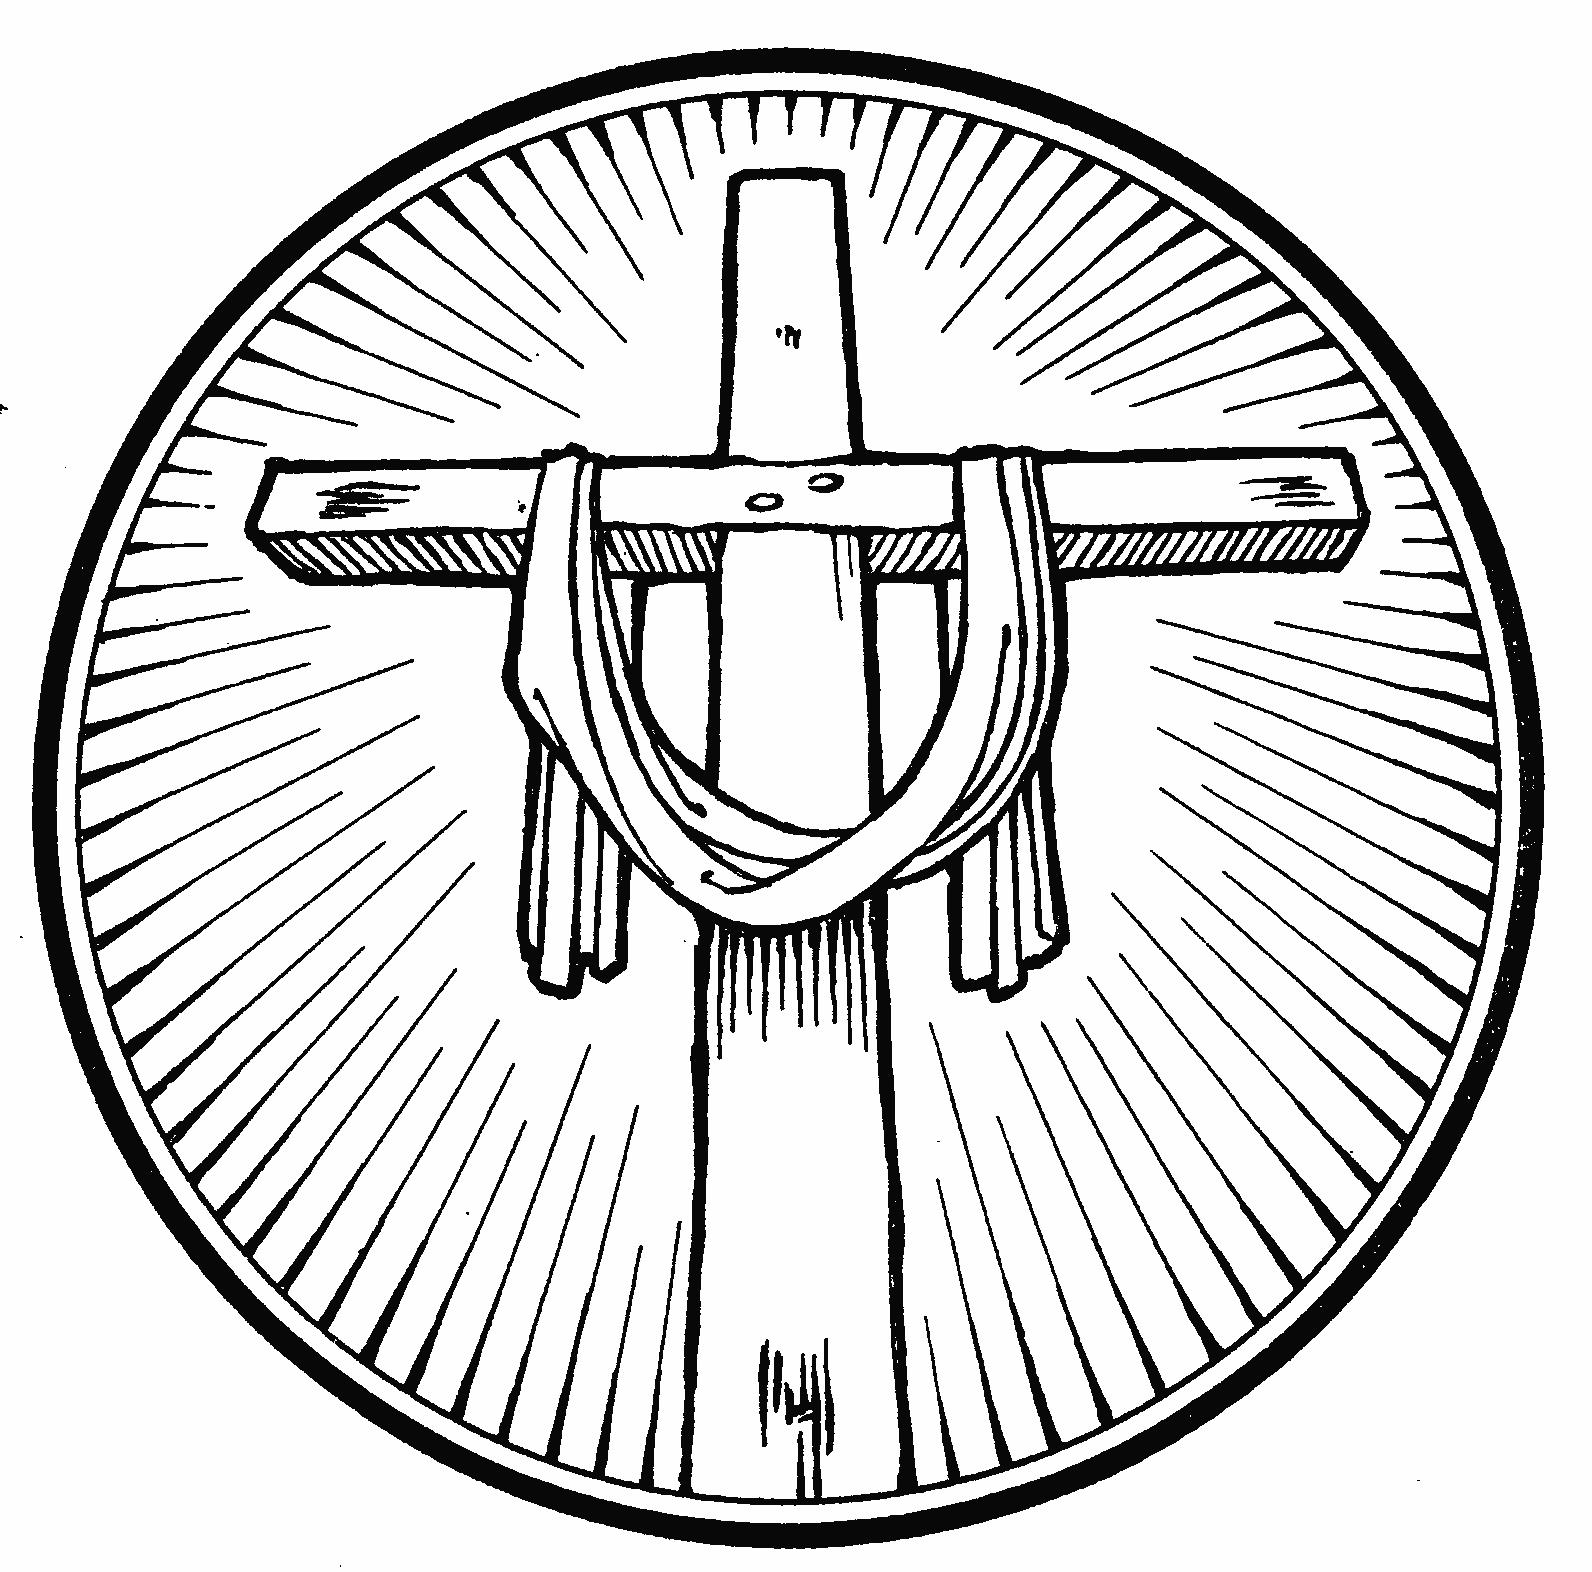 Black And White Easter Cross Clip Art - ClipArt Best